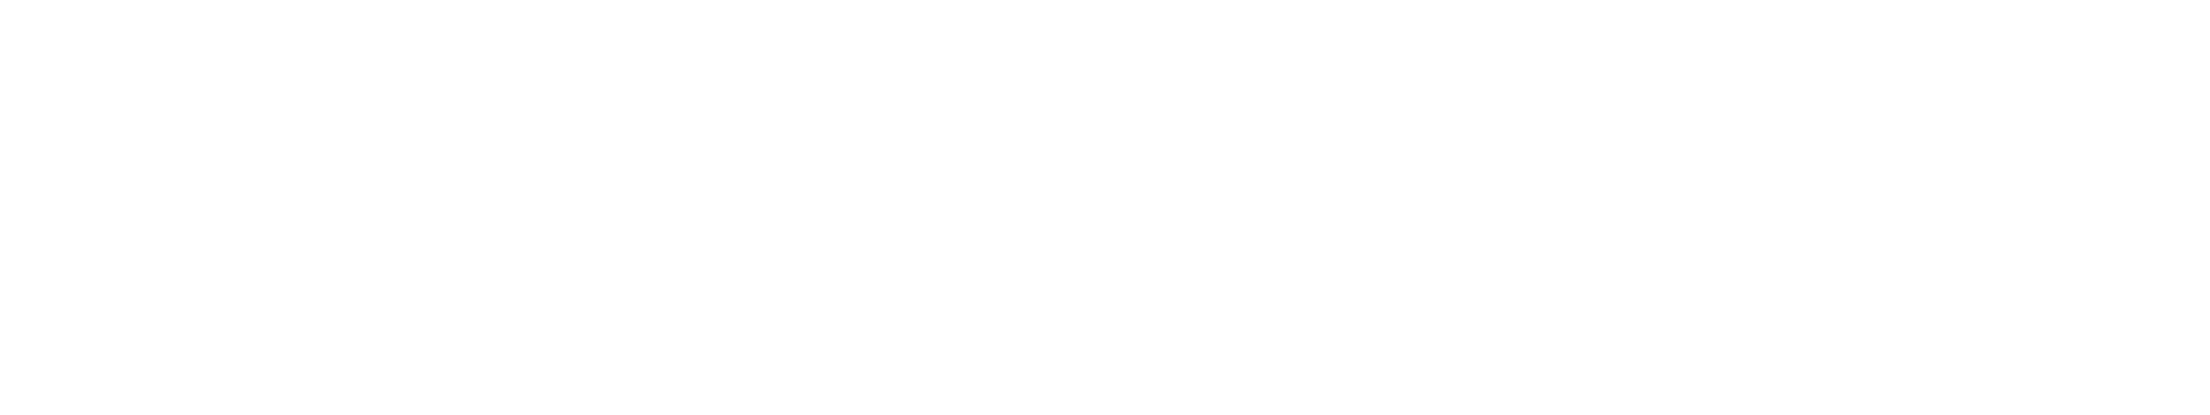 Premium Seating Irving Plaza